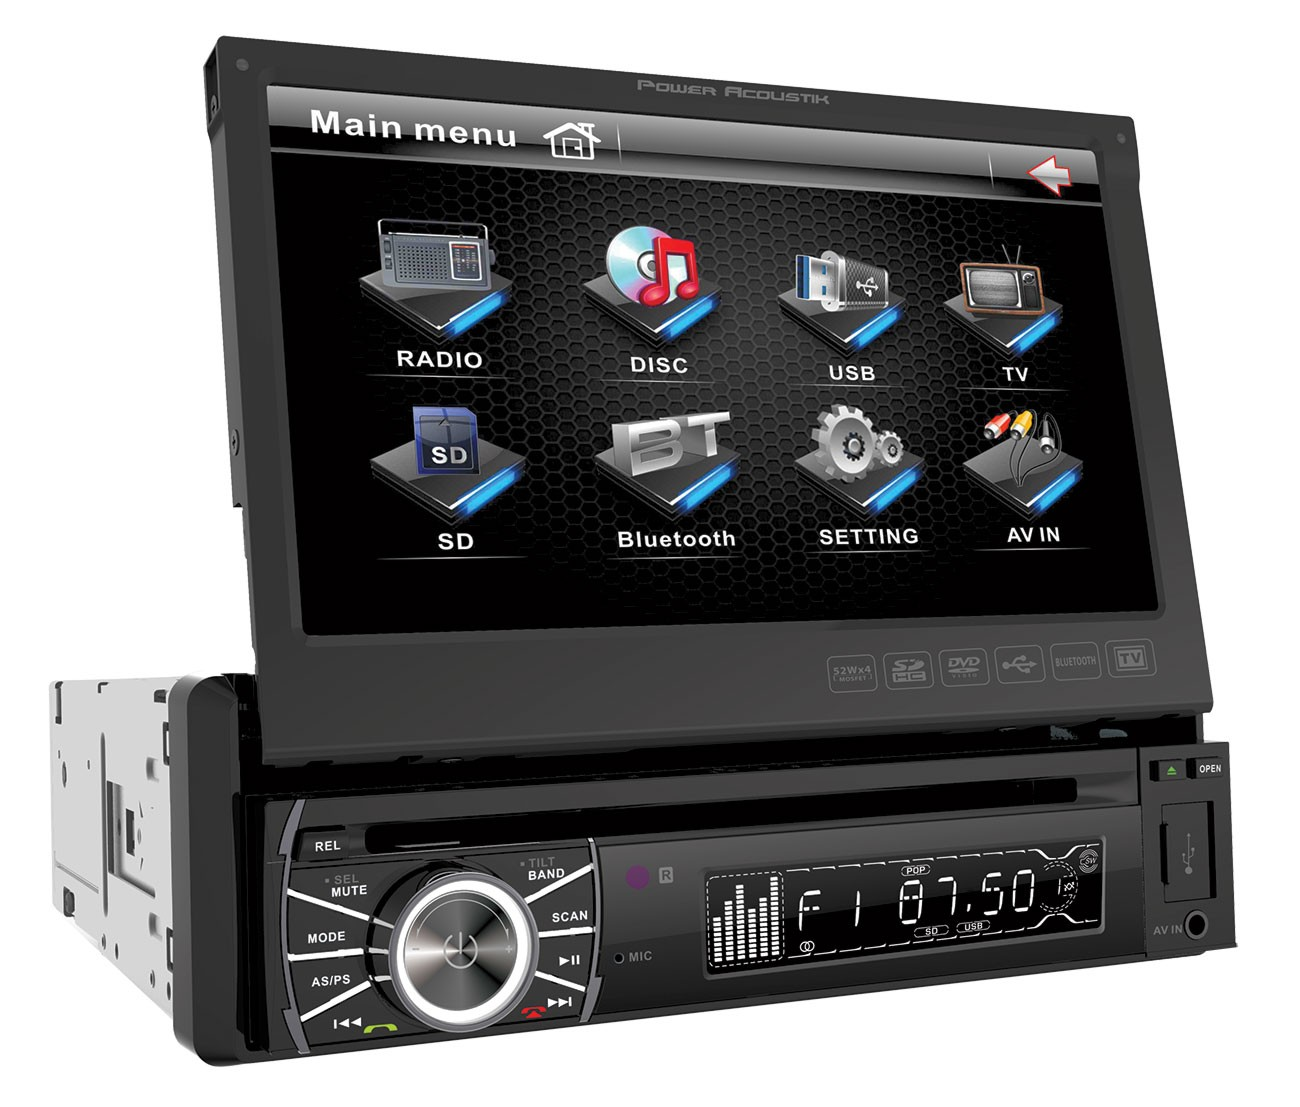 Zm 8505 Car Stereo Wiring Diagram Keywordpicturecomkeyword